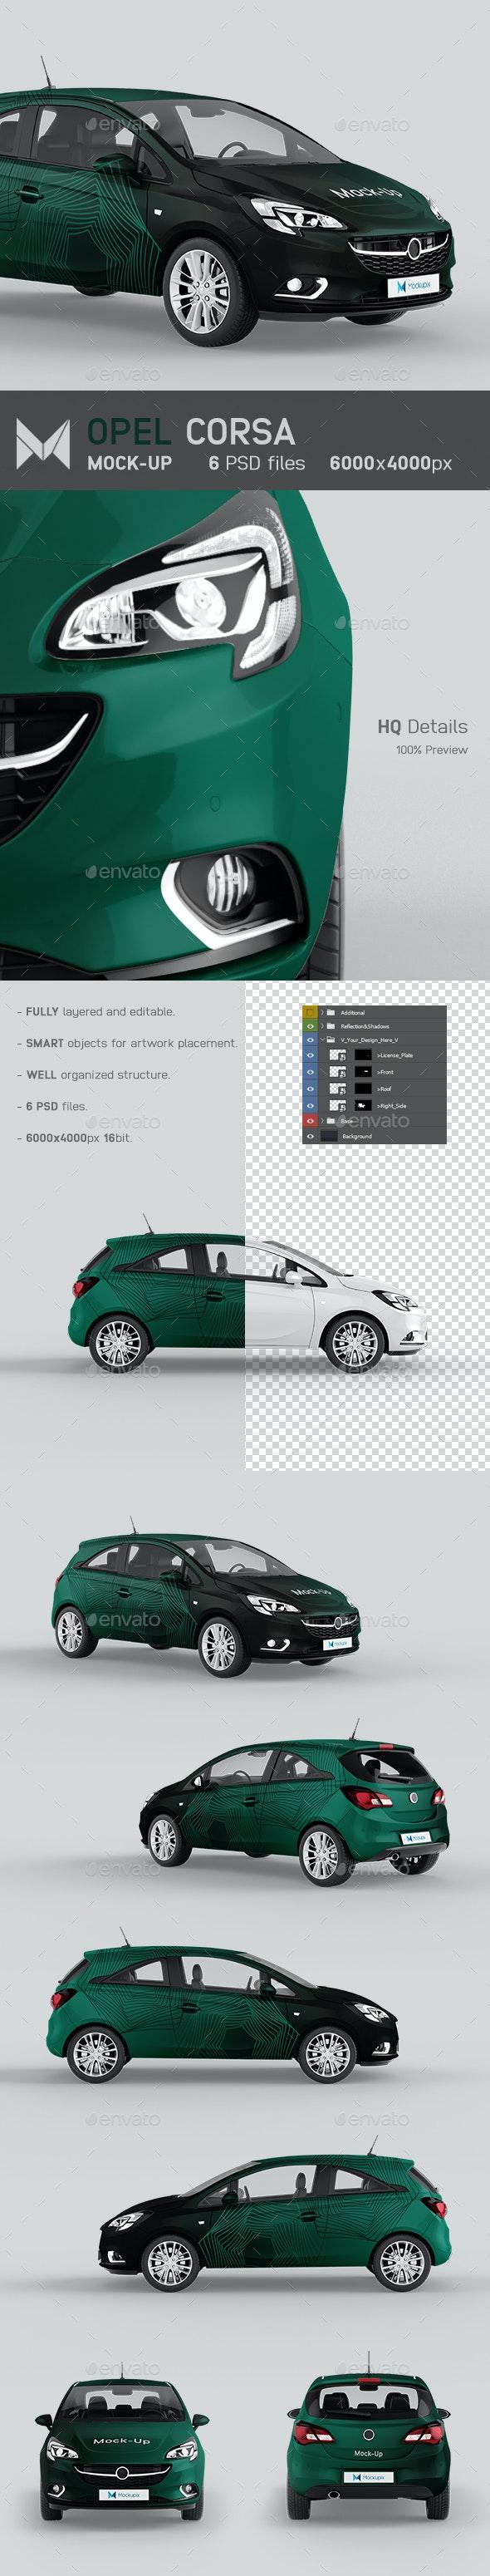 Opel Corsa Car Mockup - Vehicle Wraps Print